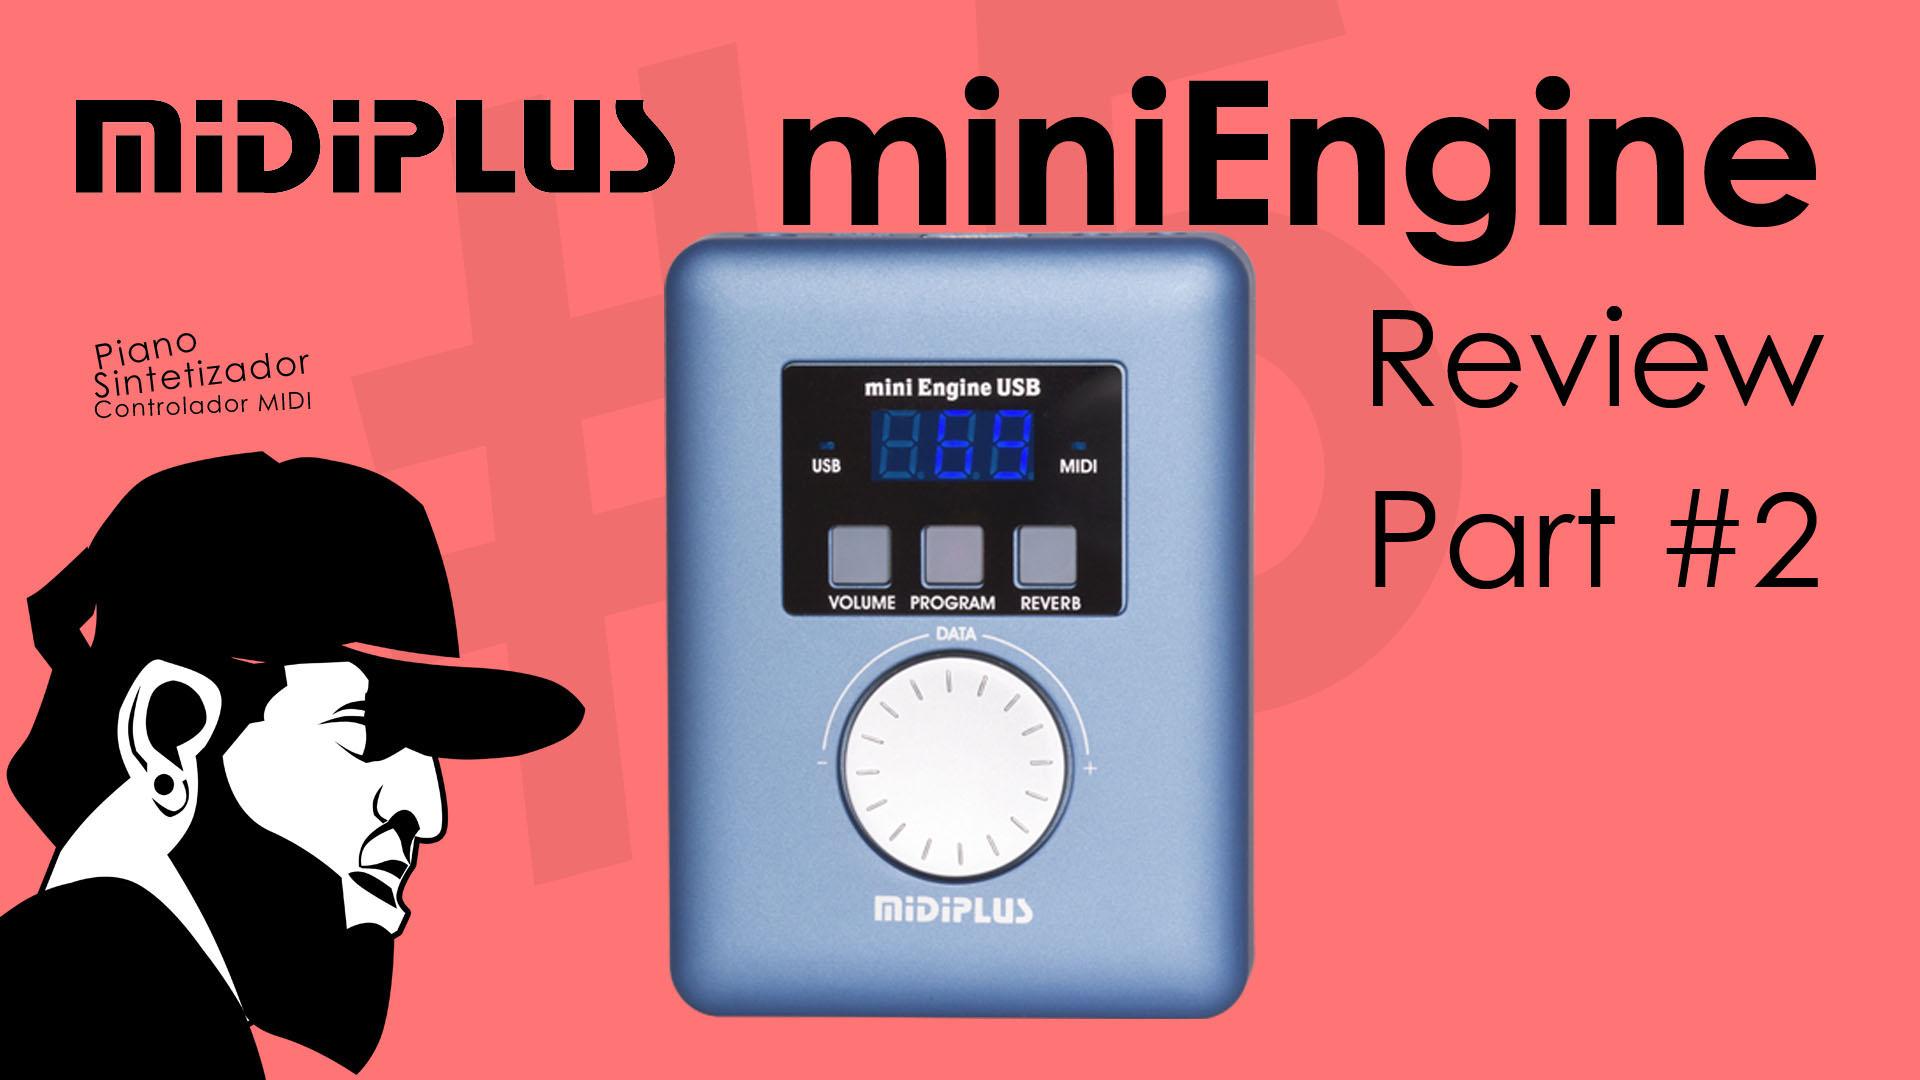 Teclado Musical De Baixo Custo #5 – Review – MidiPlus MiniEngine – Parte #2